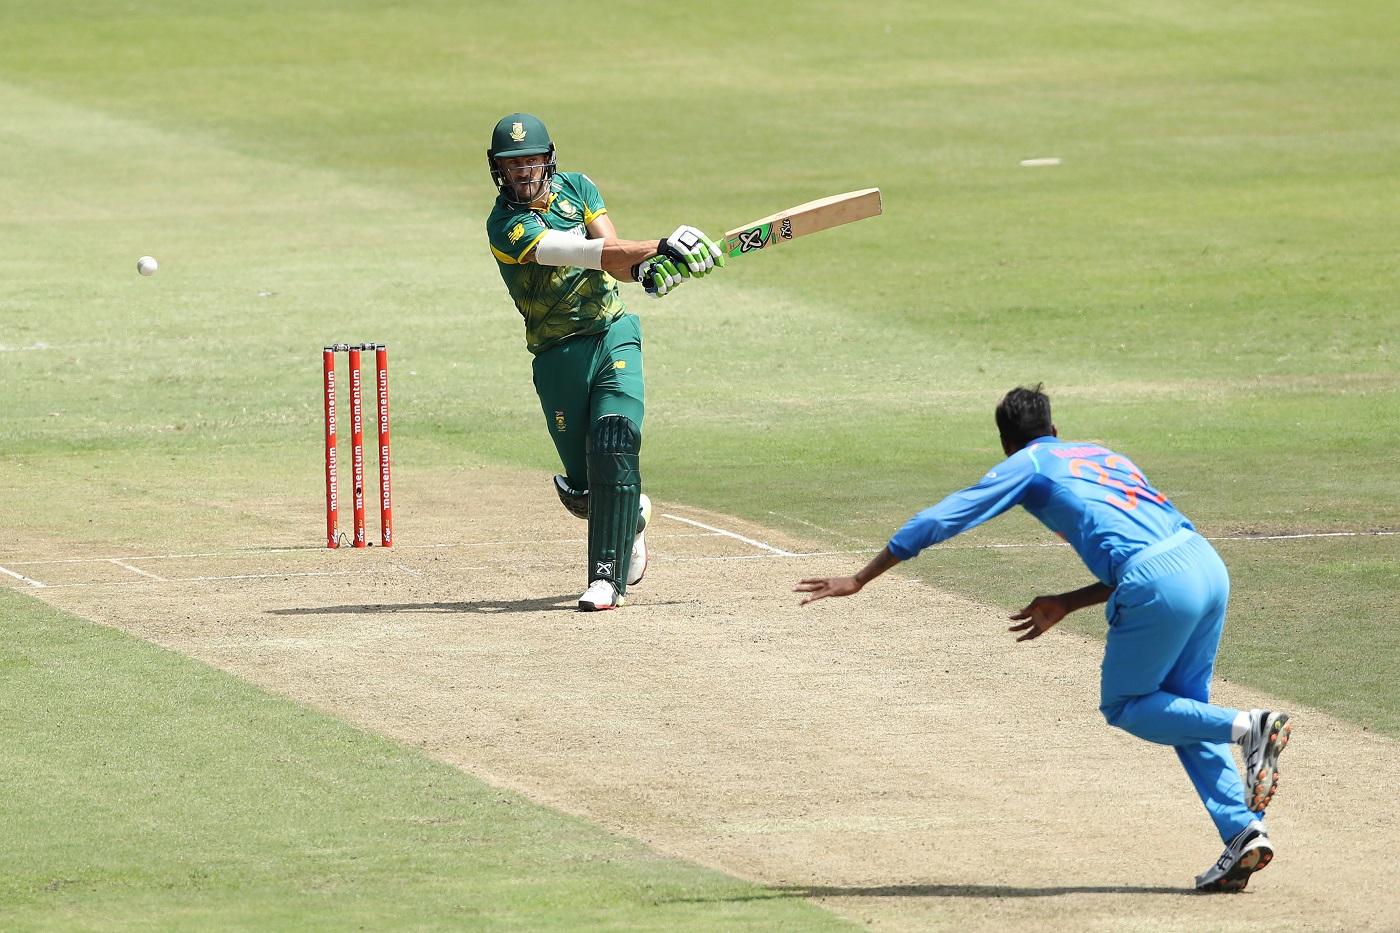 SA vs IND 2018: India Dethrone South Africa to Regain No 1 Spot in ODI Rankings